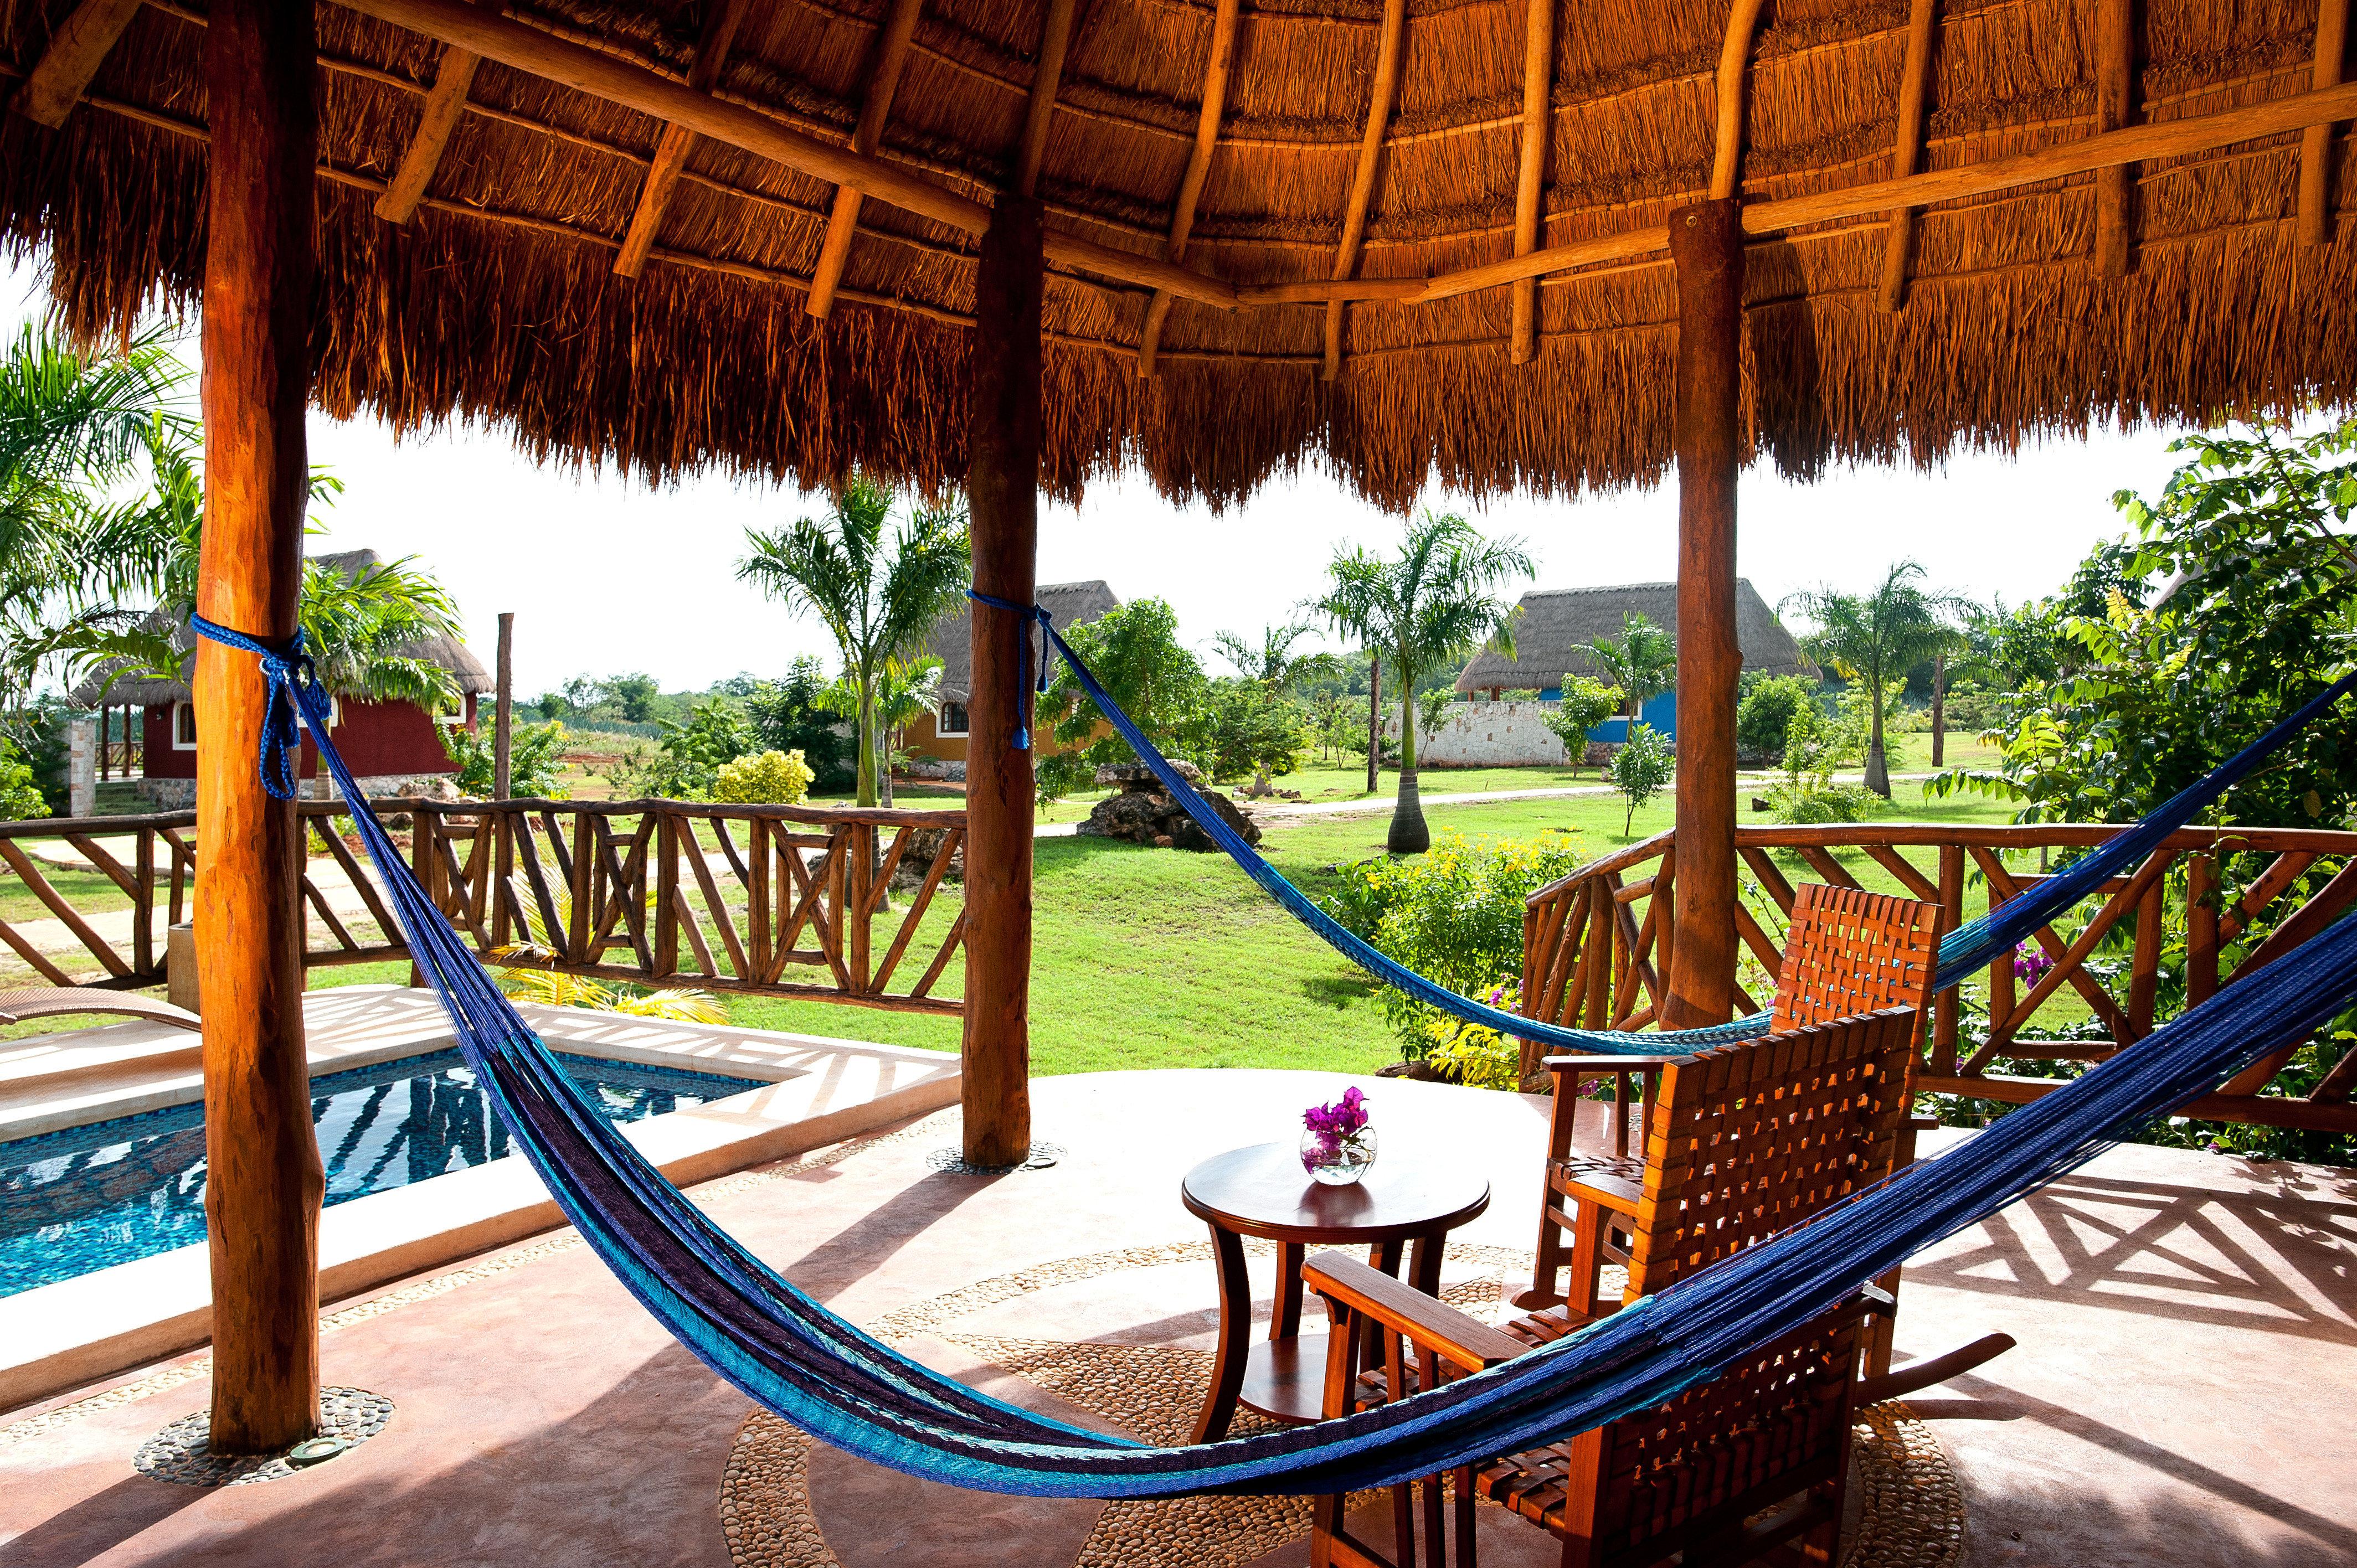 Drink Lounge Luxury Pool ground tree leisure Resort backyard